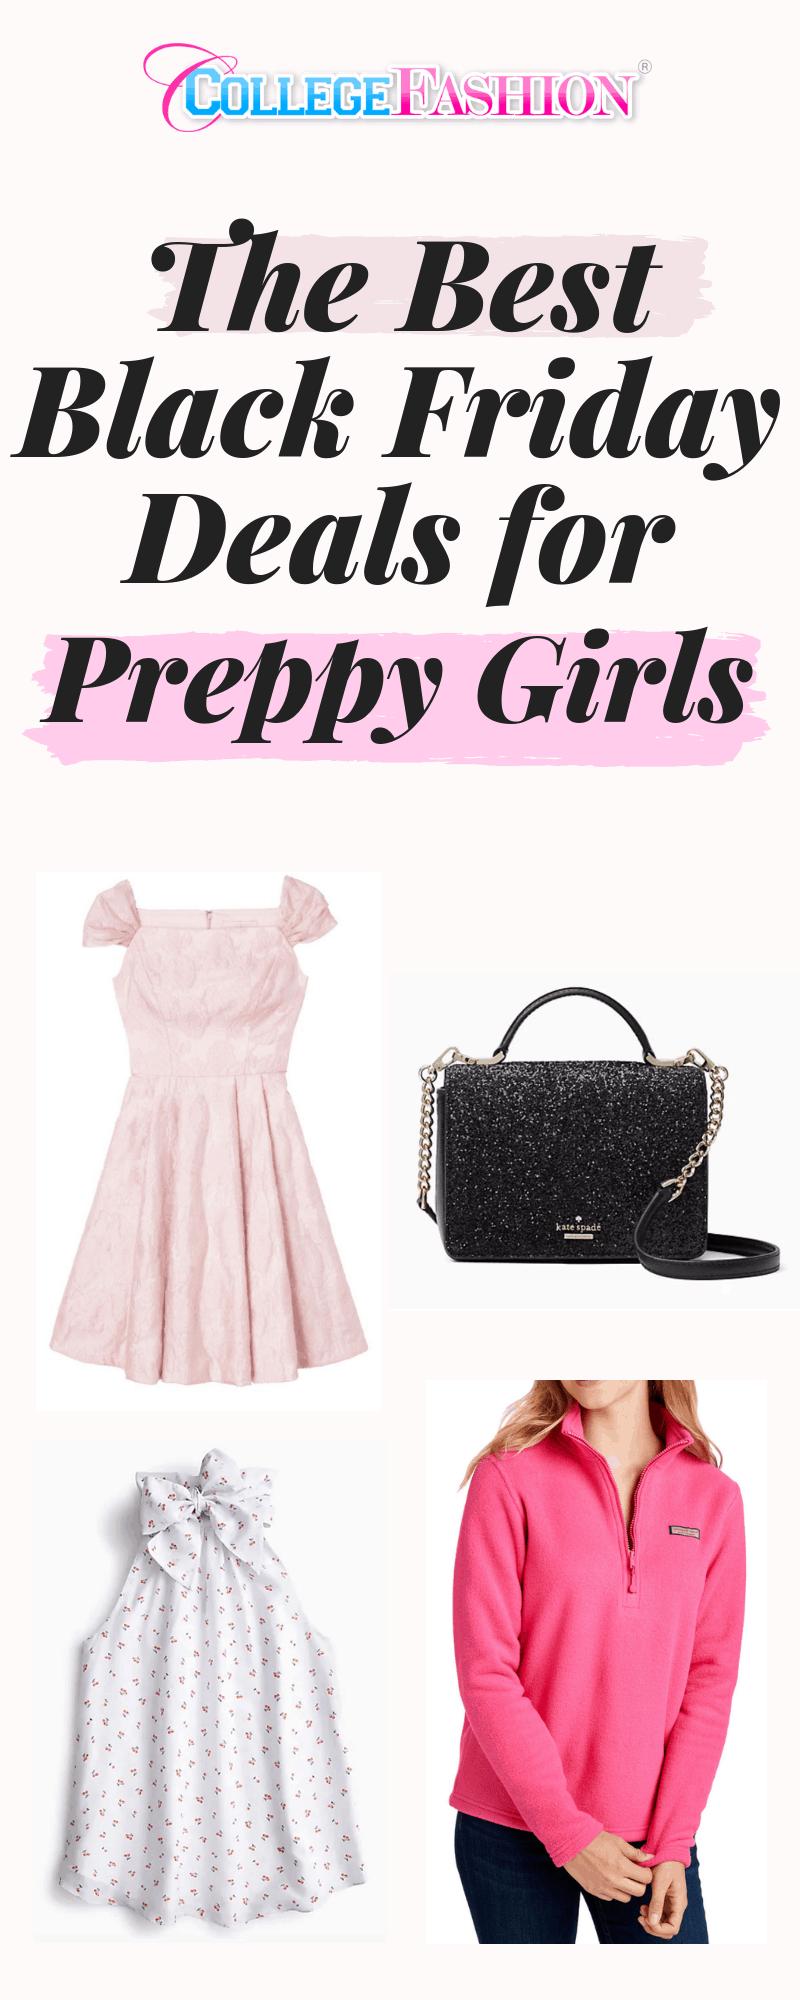 Best Black Friday deals for preppy girls